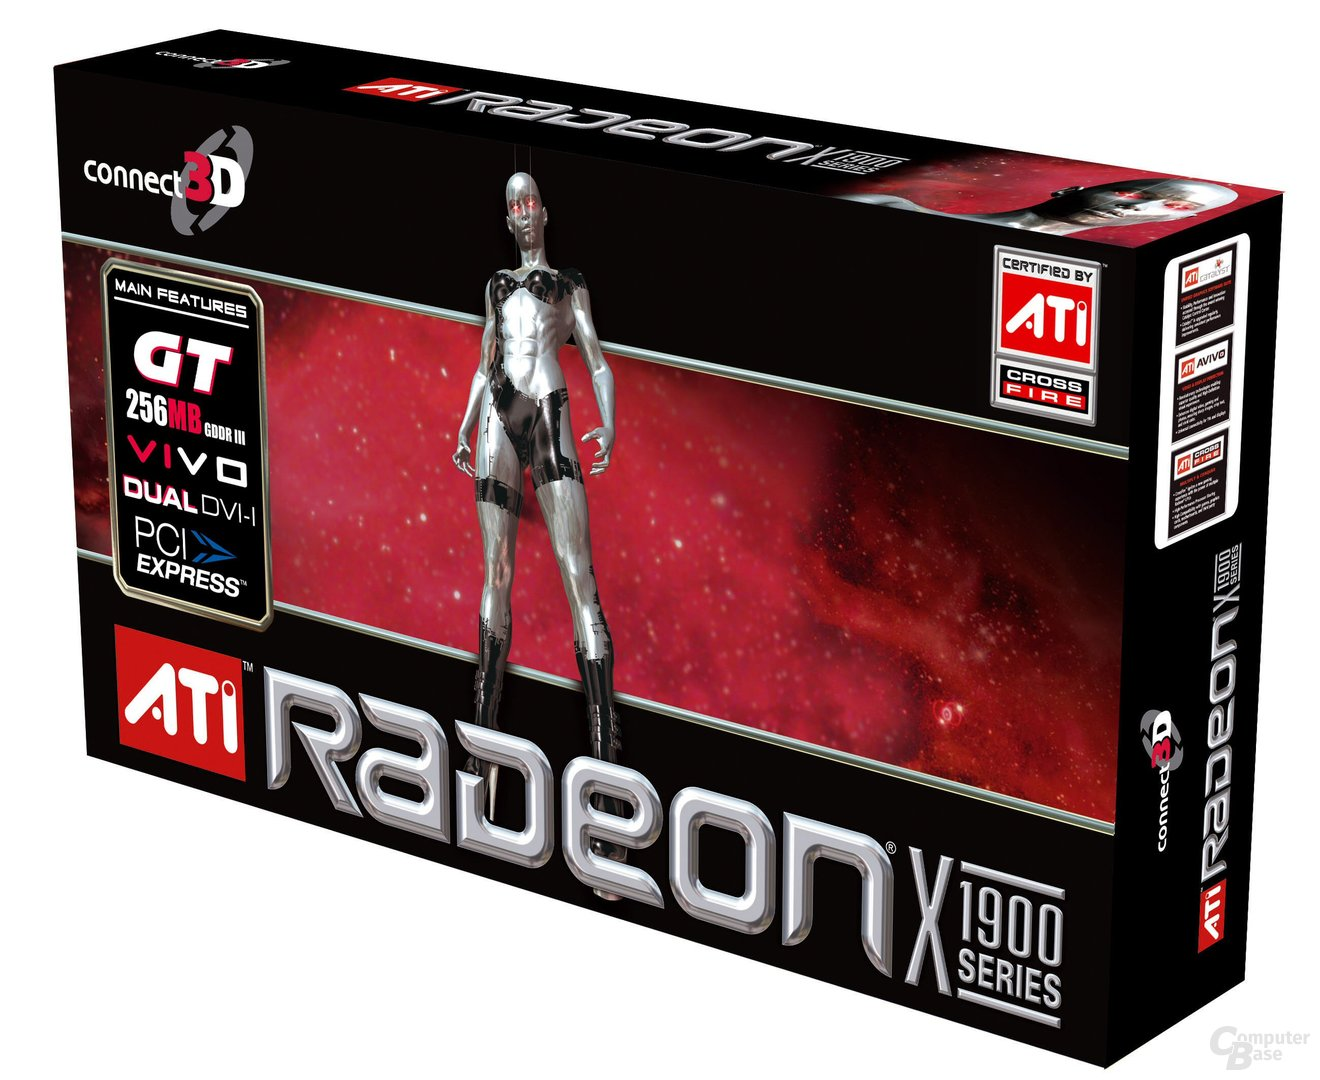 Connect3D Radeon X1900 GT - Box